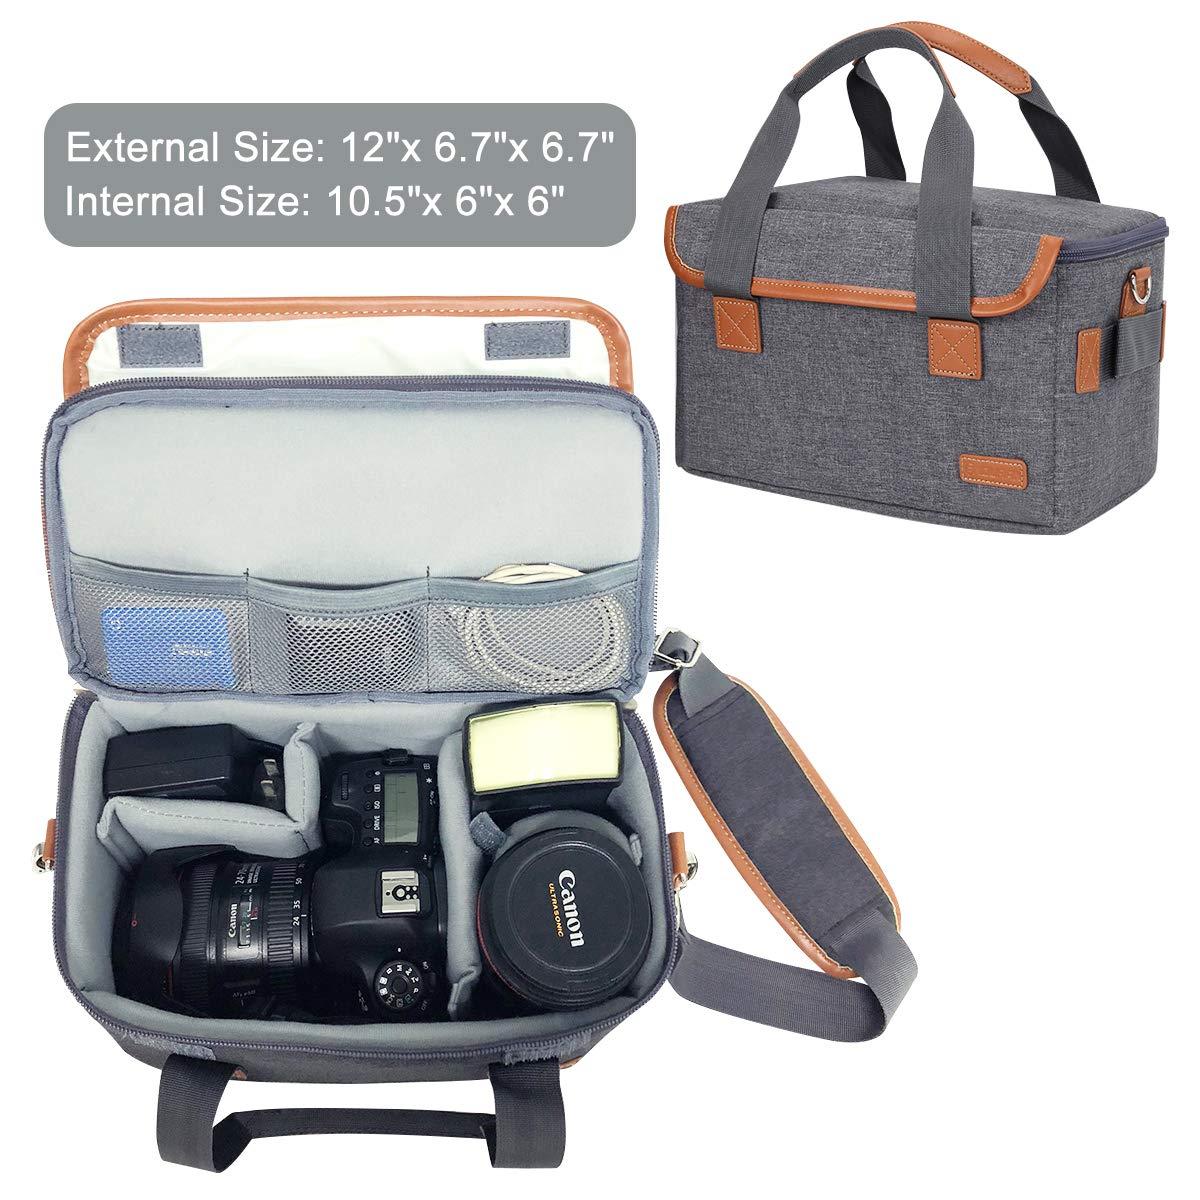 Mochila Impermeable para c/ámara de Fotos de 15,6 Pulgadas con Bolsa para c/ámara DSLR incorporada Color Gris Oscuro Endurax